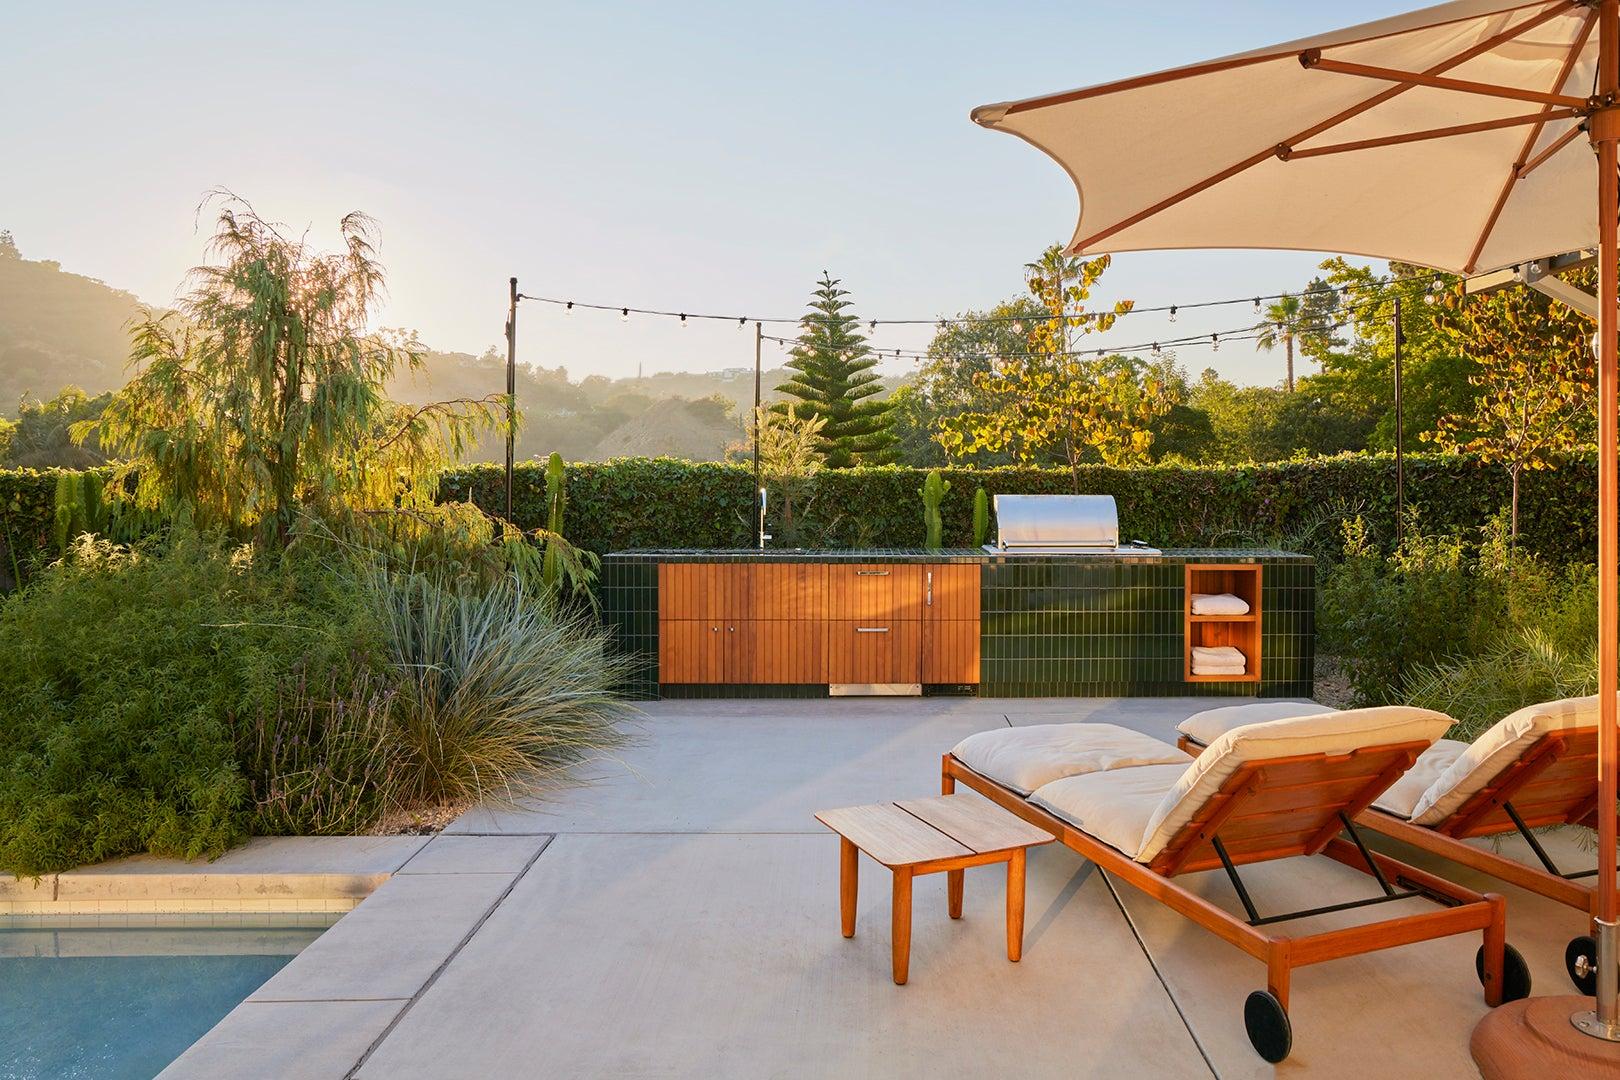 00-FEATURE-Tiled-Outdoor-Kitchen-Bright-Idea-domino